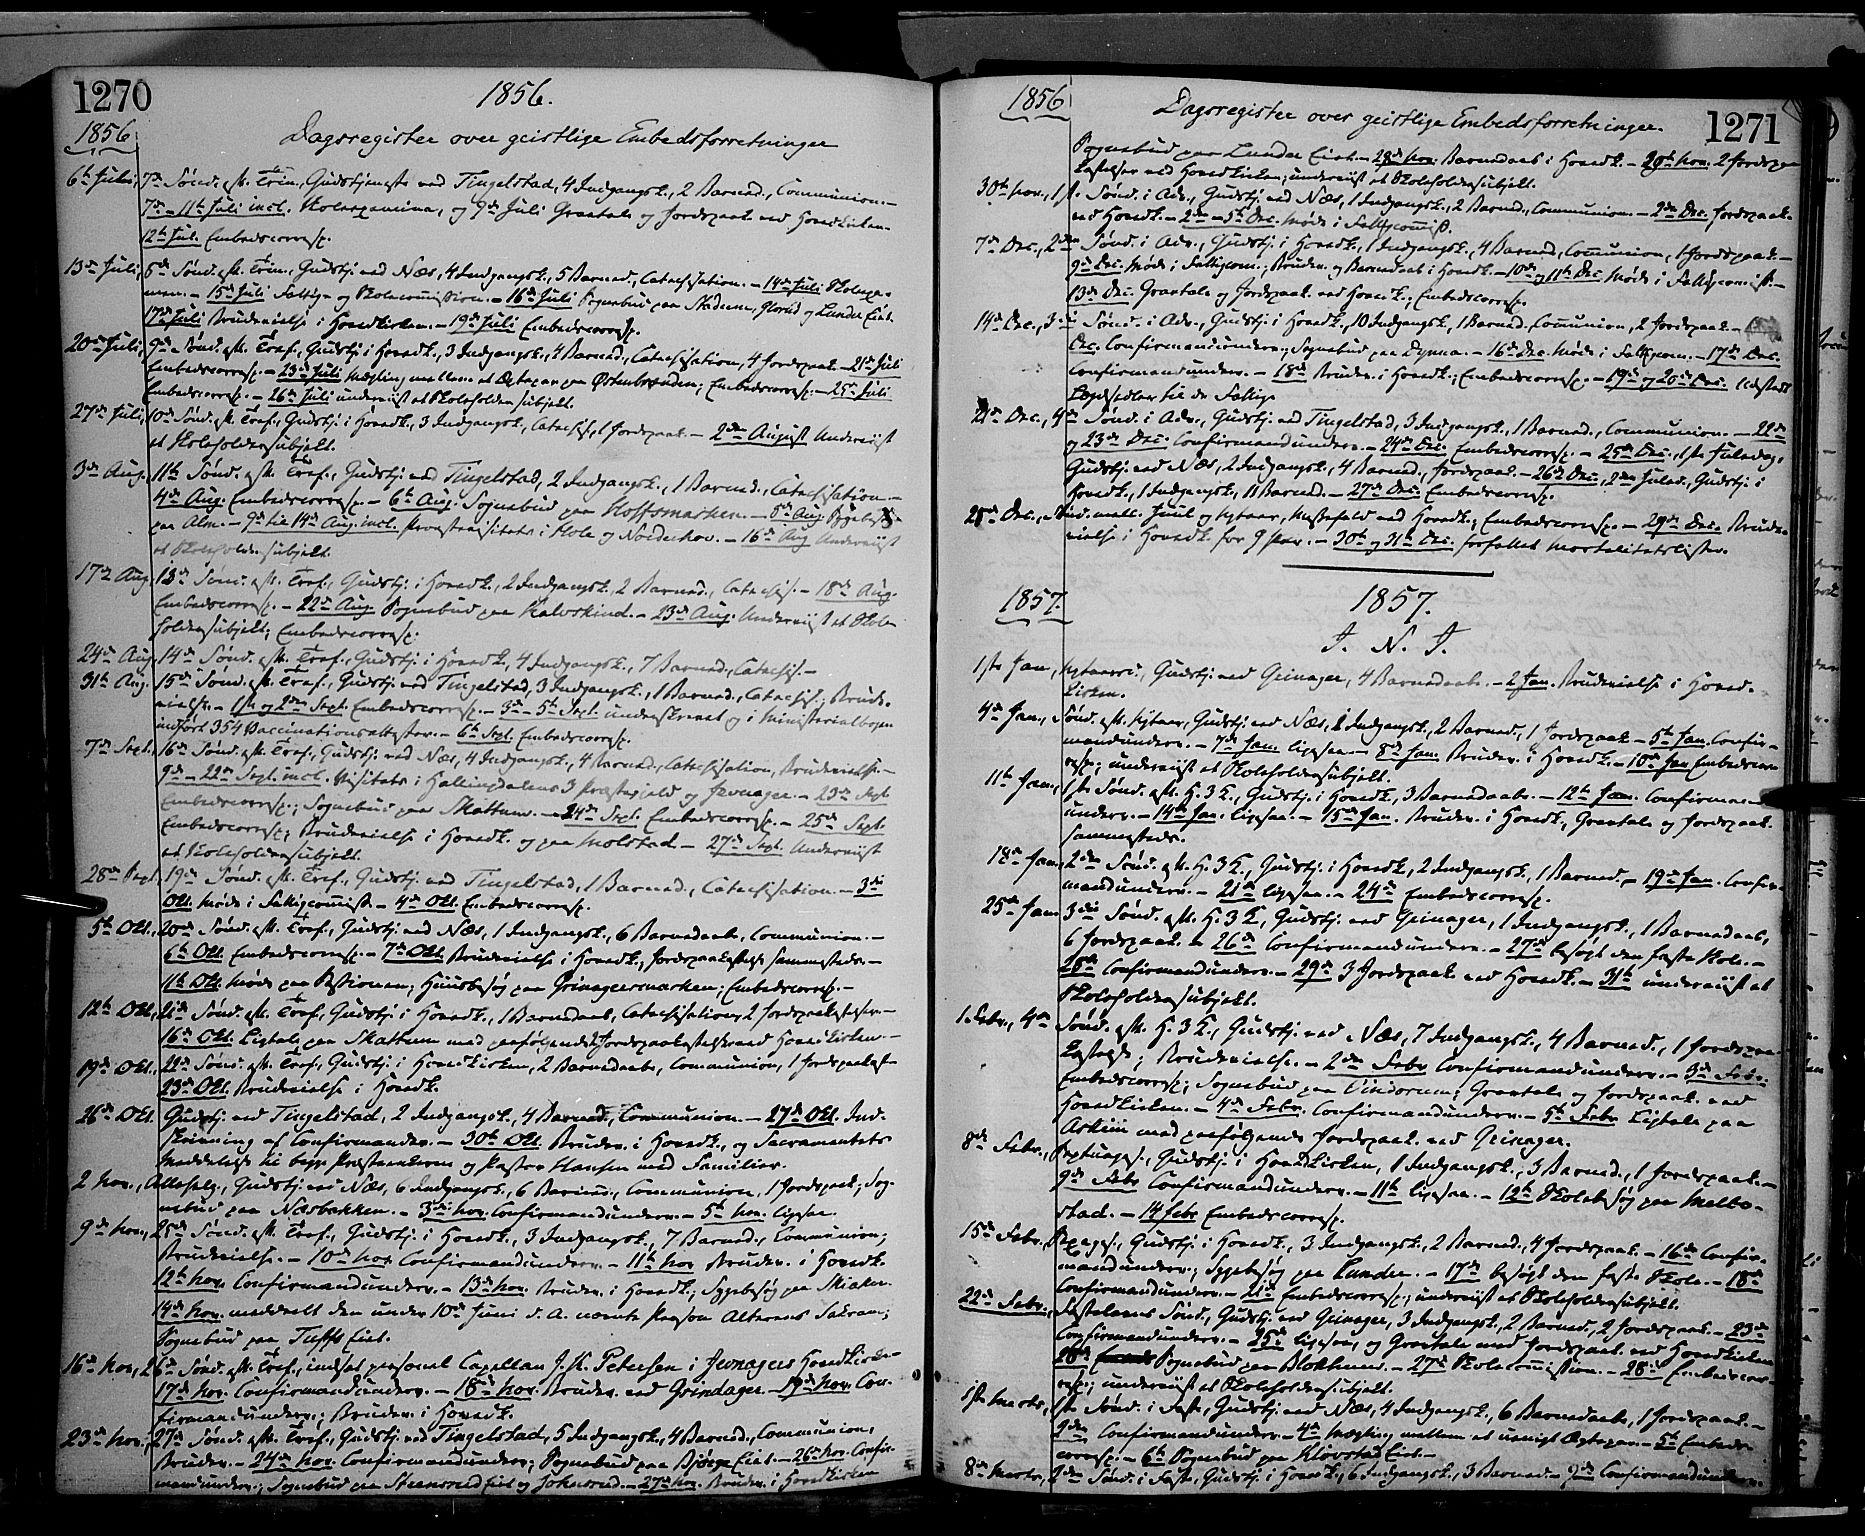 SAH, Gran prestekontor, Parish register (official) no. 12, 1856-1874, p. 1270-1271